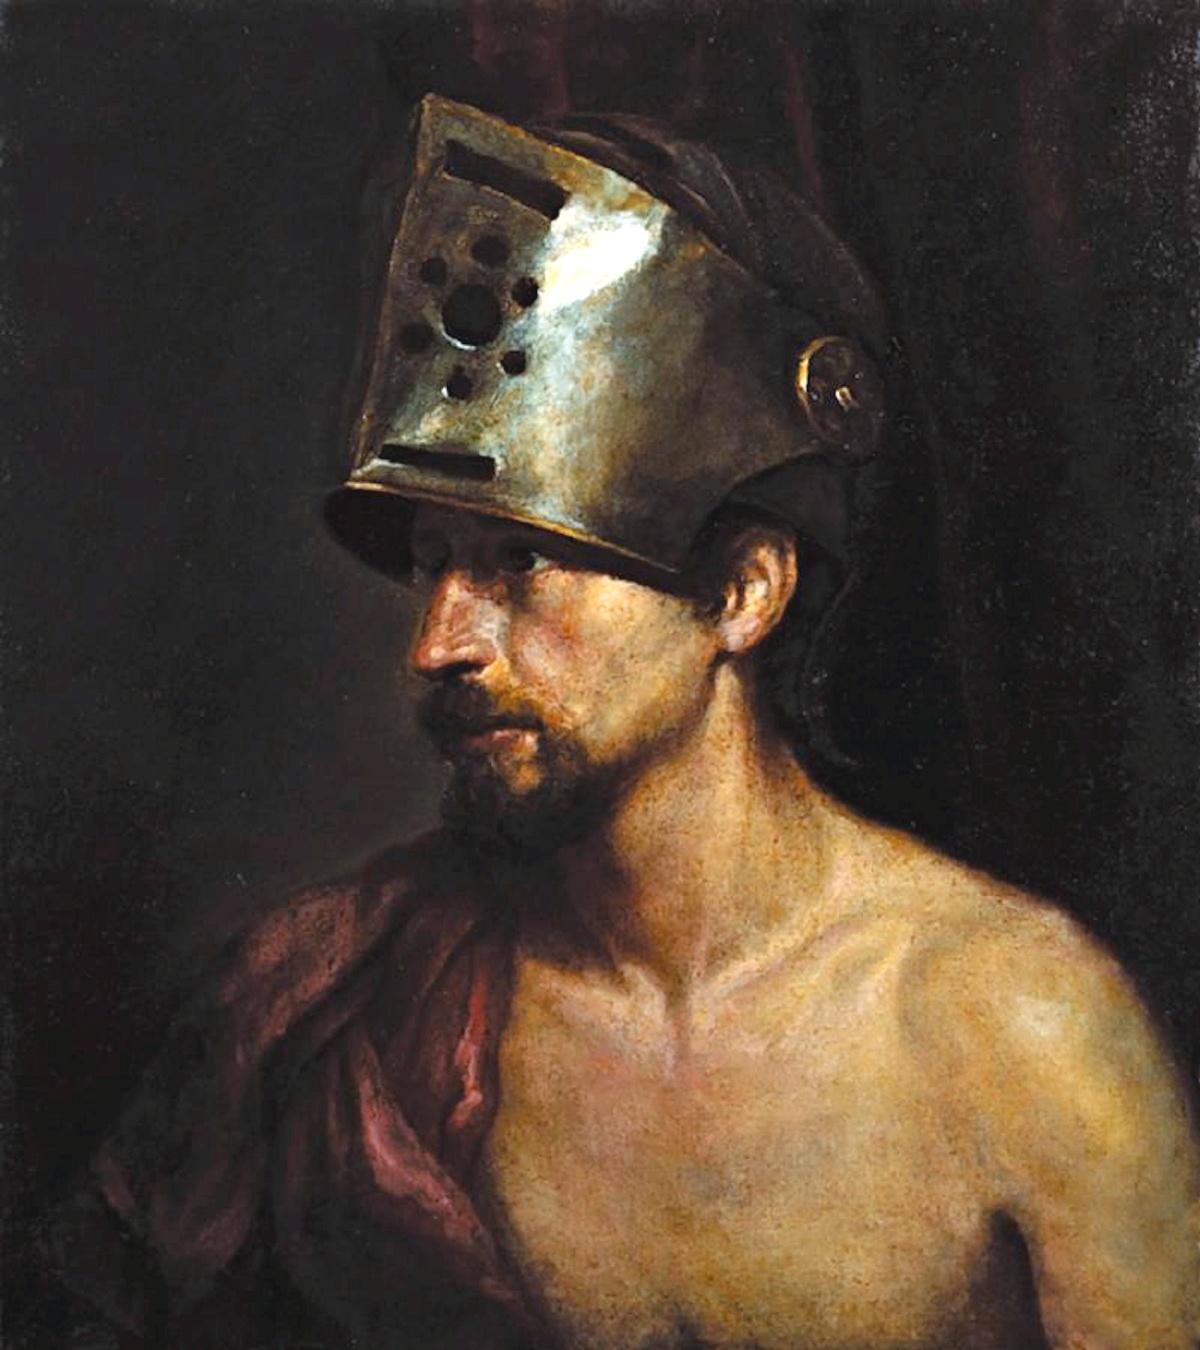 00 Mikhail Shankov. A Naked Man Wearing a Helmet. 1983